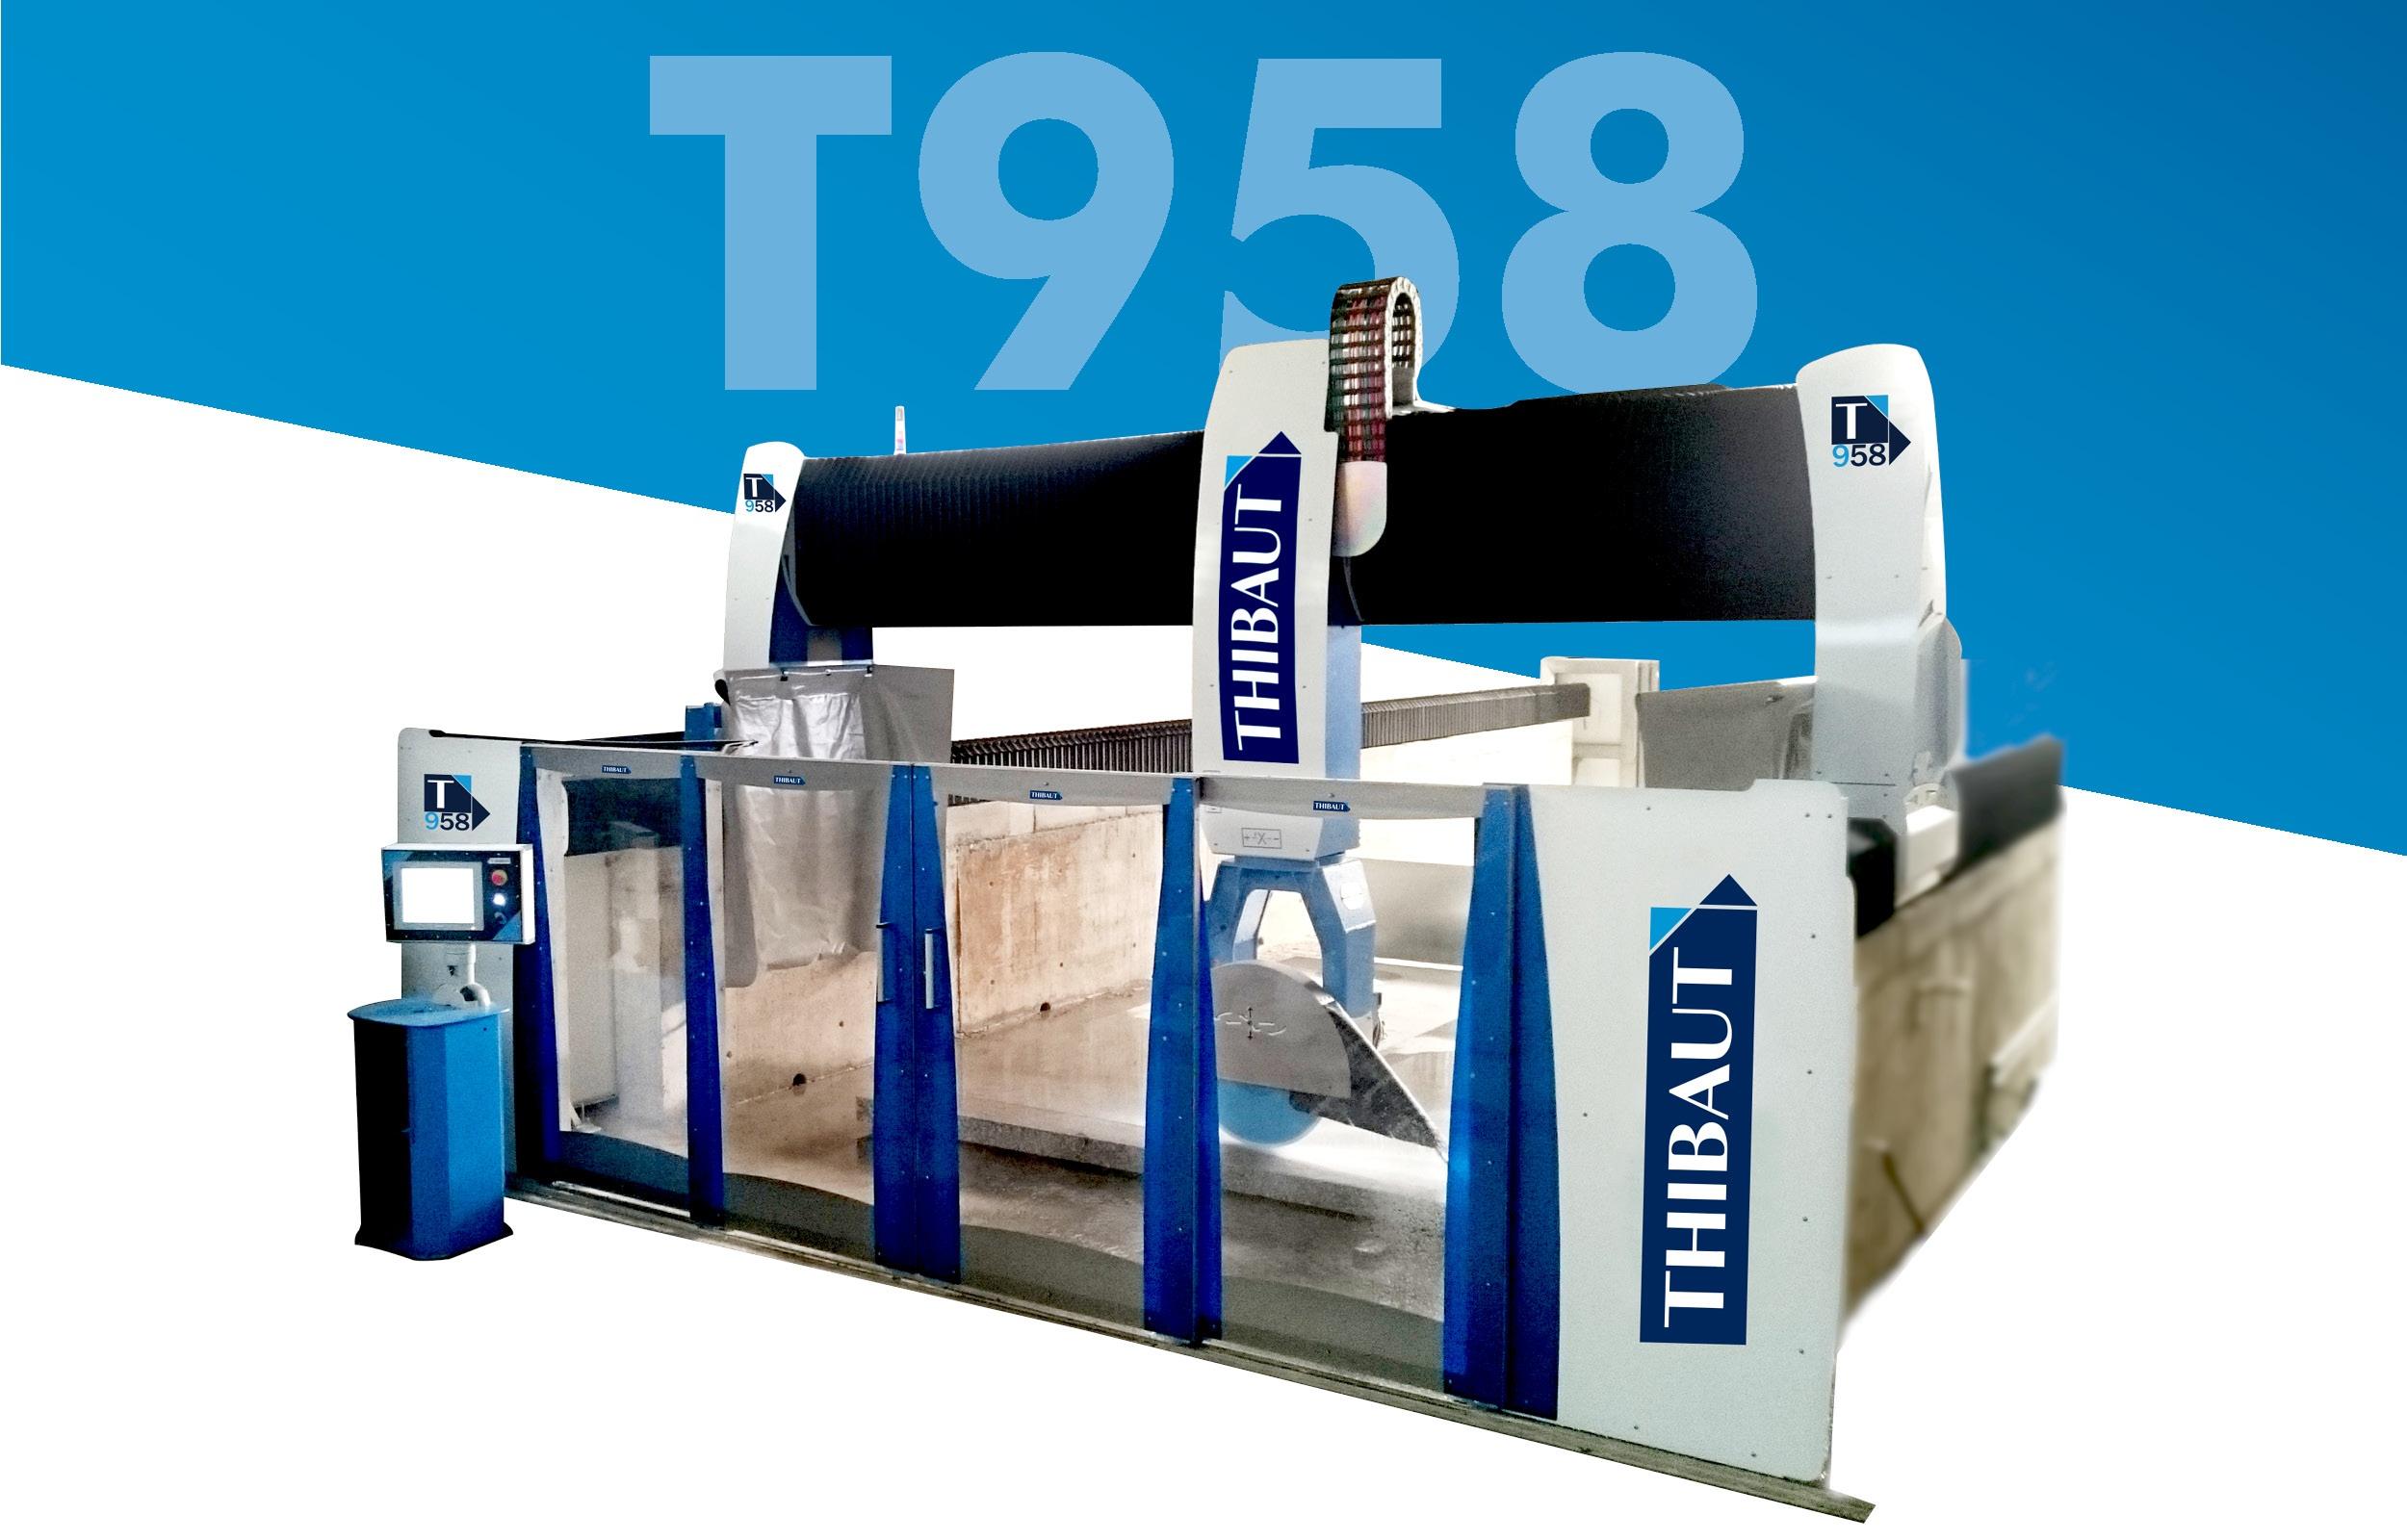 Multifunction machine / T958 / 5 axes